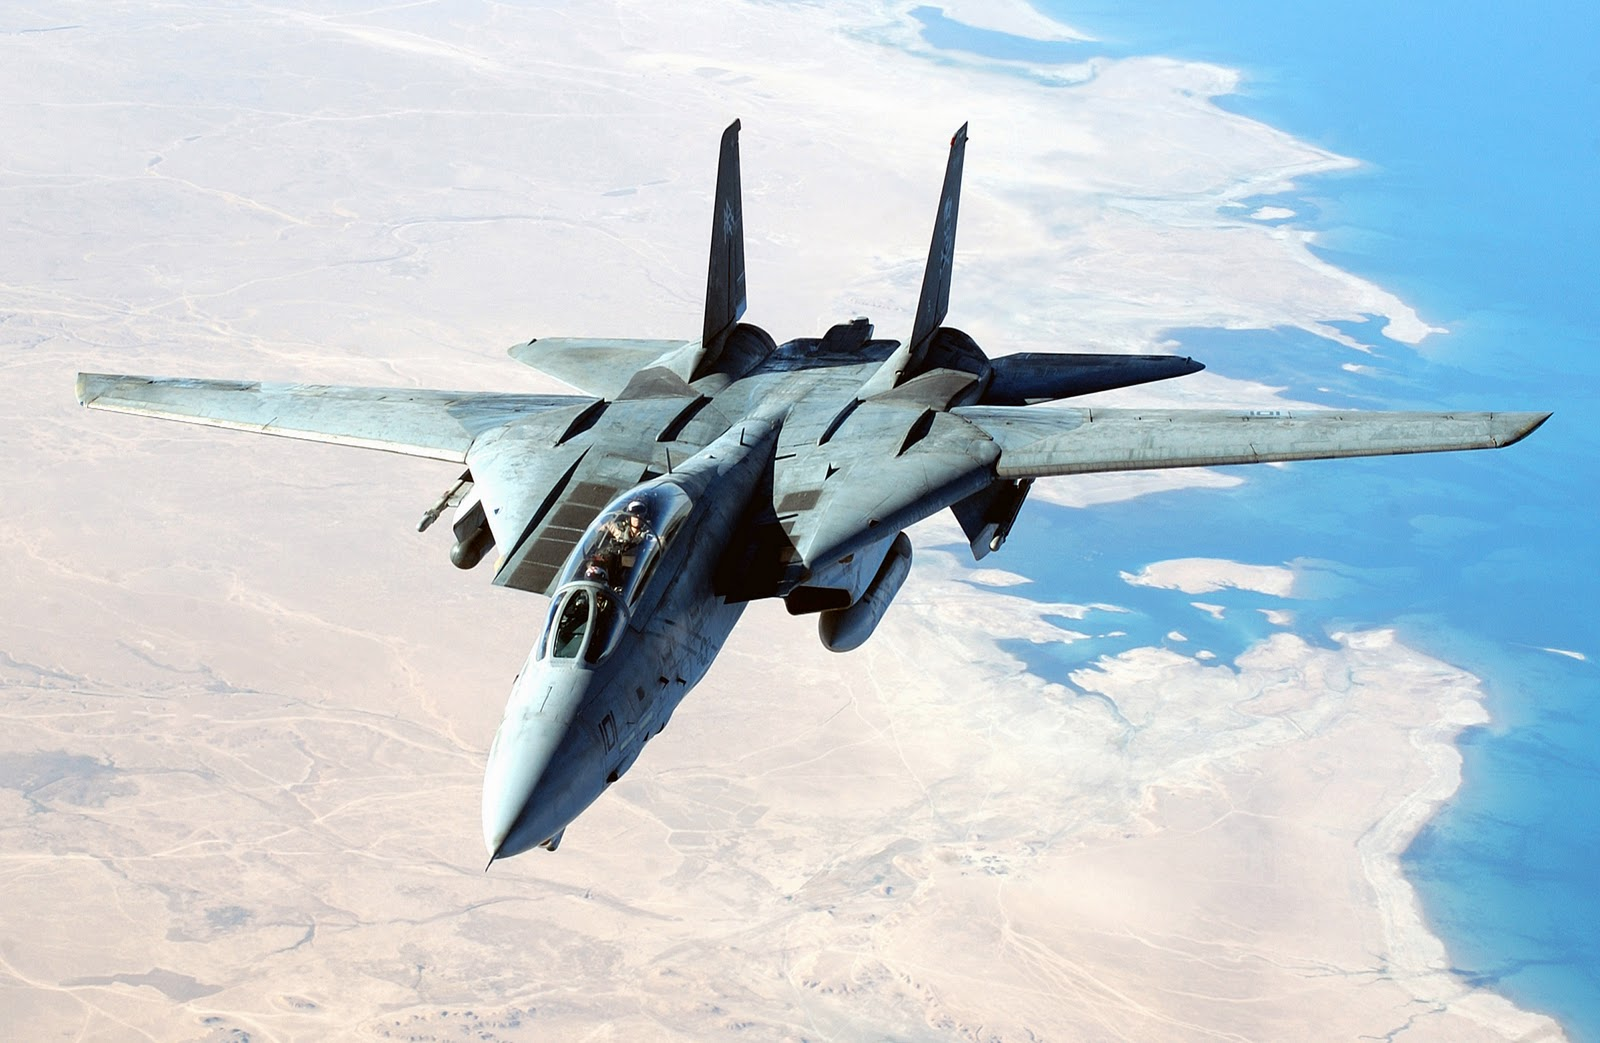 F-14 Tomcat Fighter Plane Photo - 04.jpg